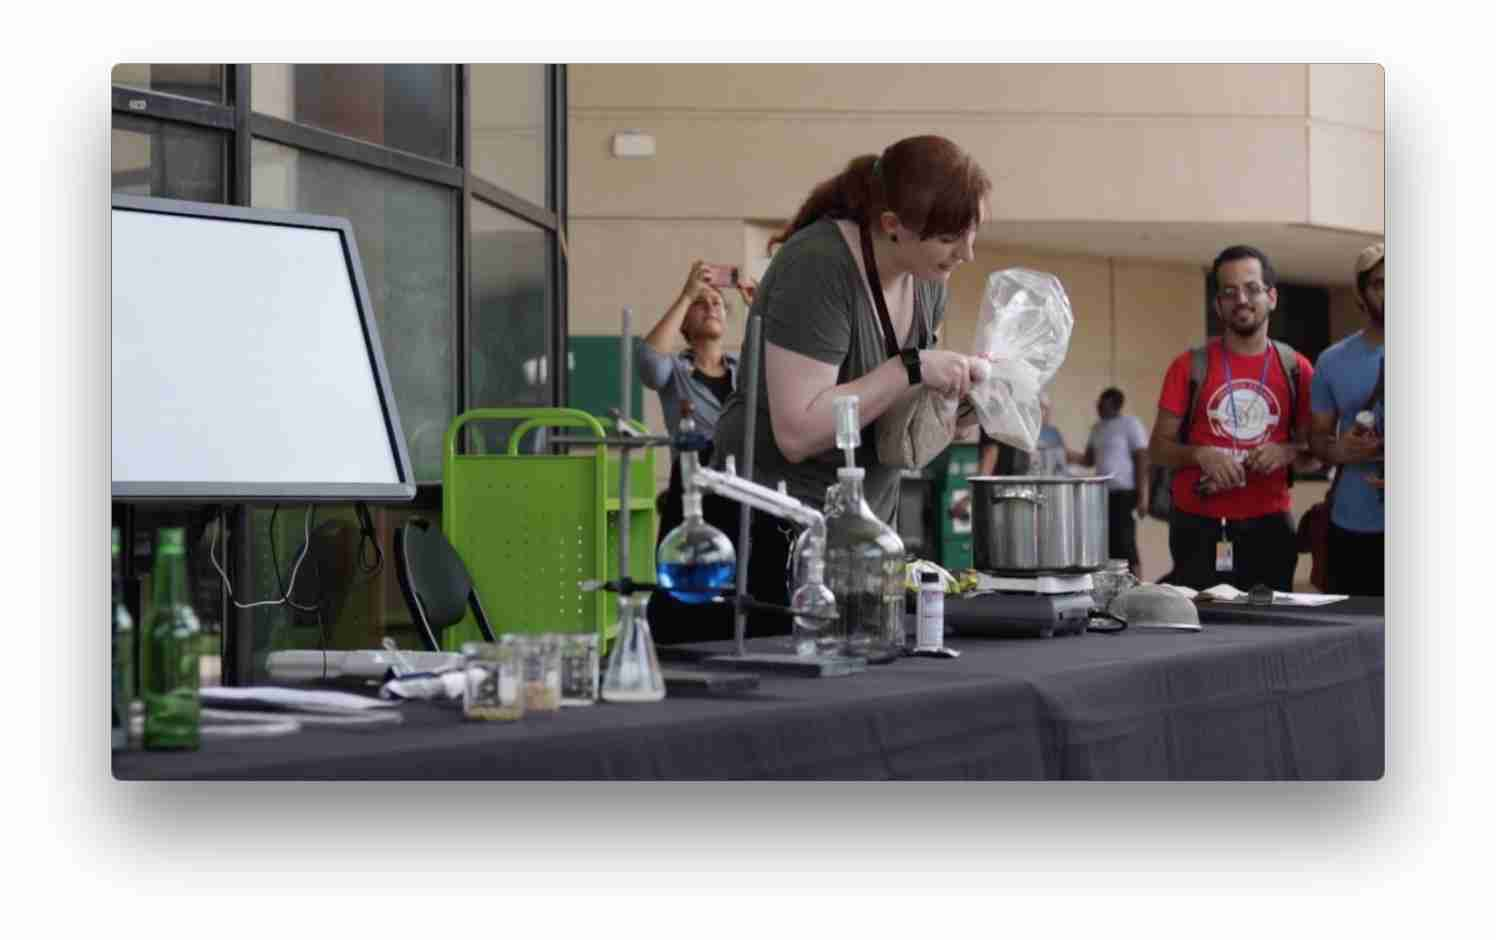 Science tutor Amanda Lantieri discusses the chemistry of beer-making.